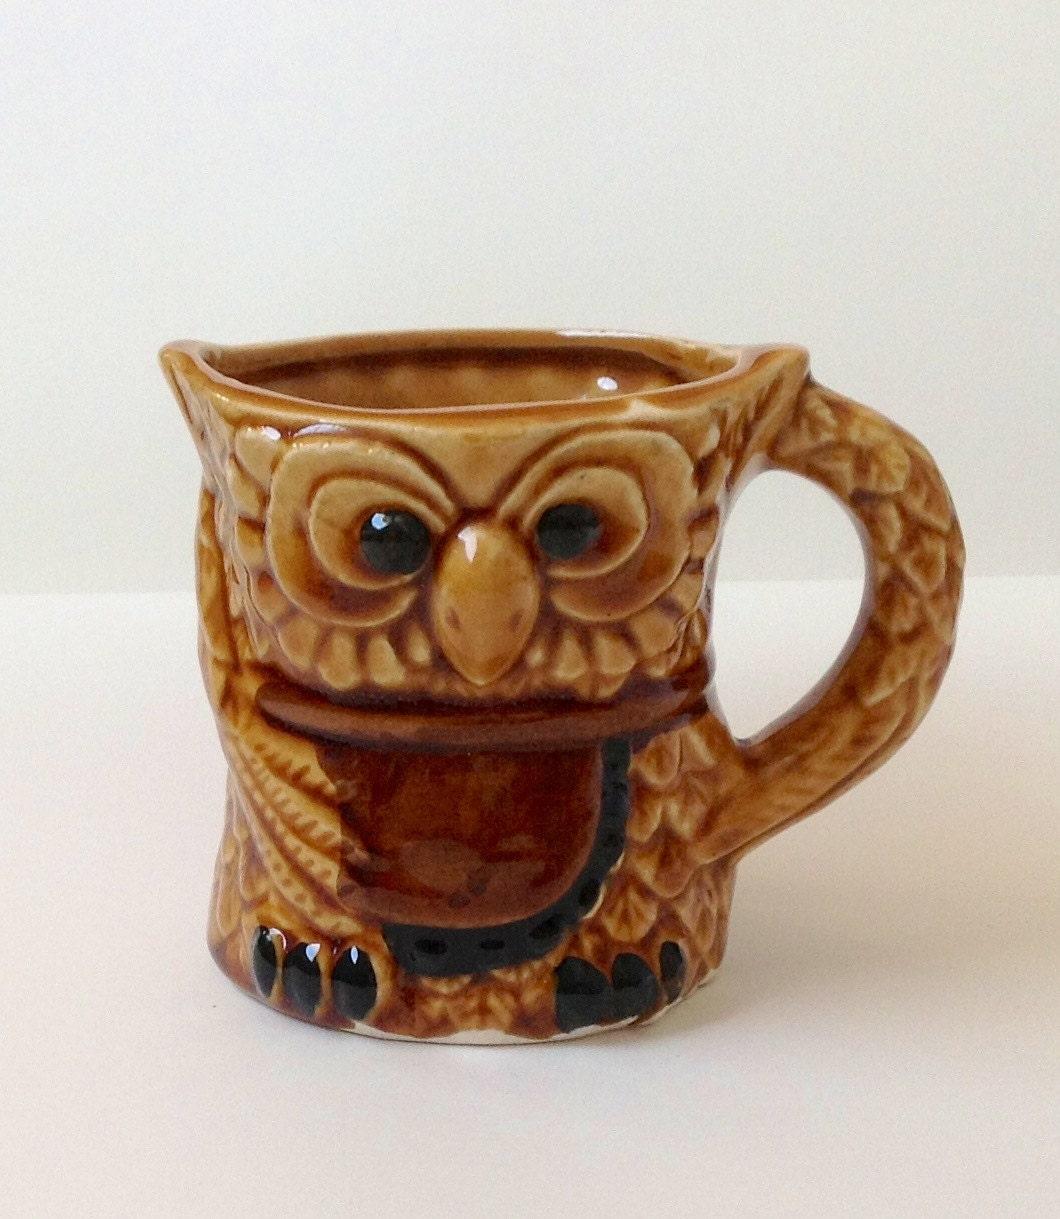 owl mug on sale vintage ceramic coffee cup by fostandlound